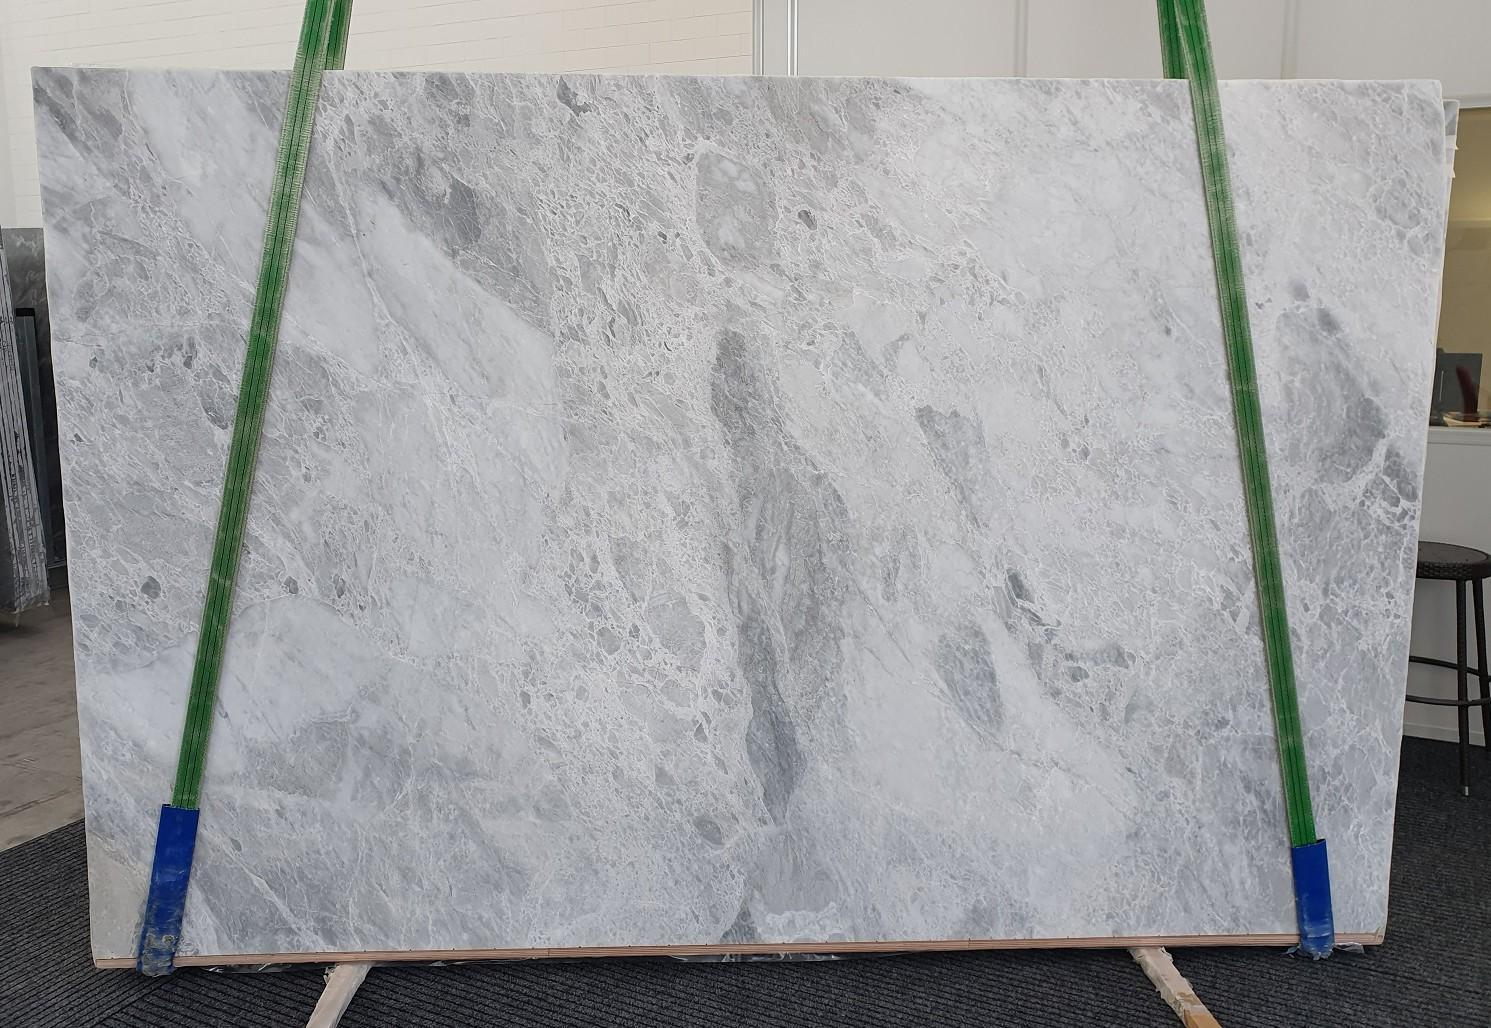 TRAMBISERA Fourniture Veneto (Italie) d' dalles brillantes en marbre naturel 12931 , Bnd01-Slb08